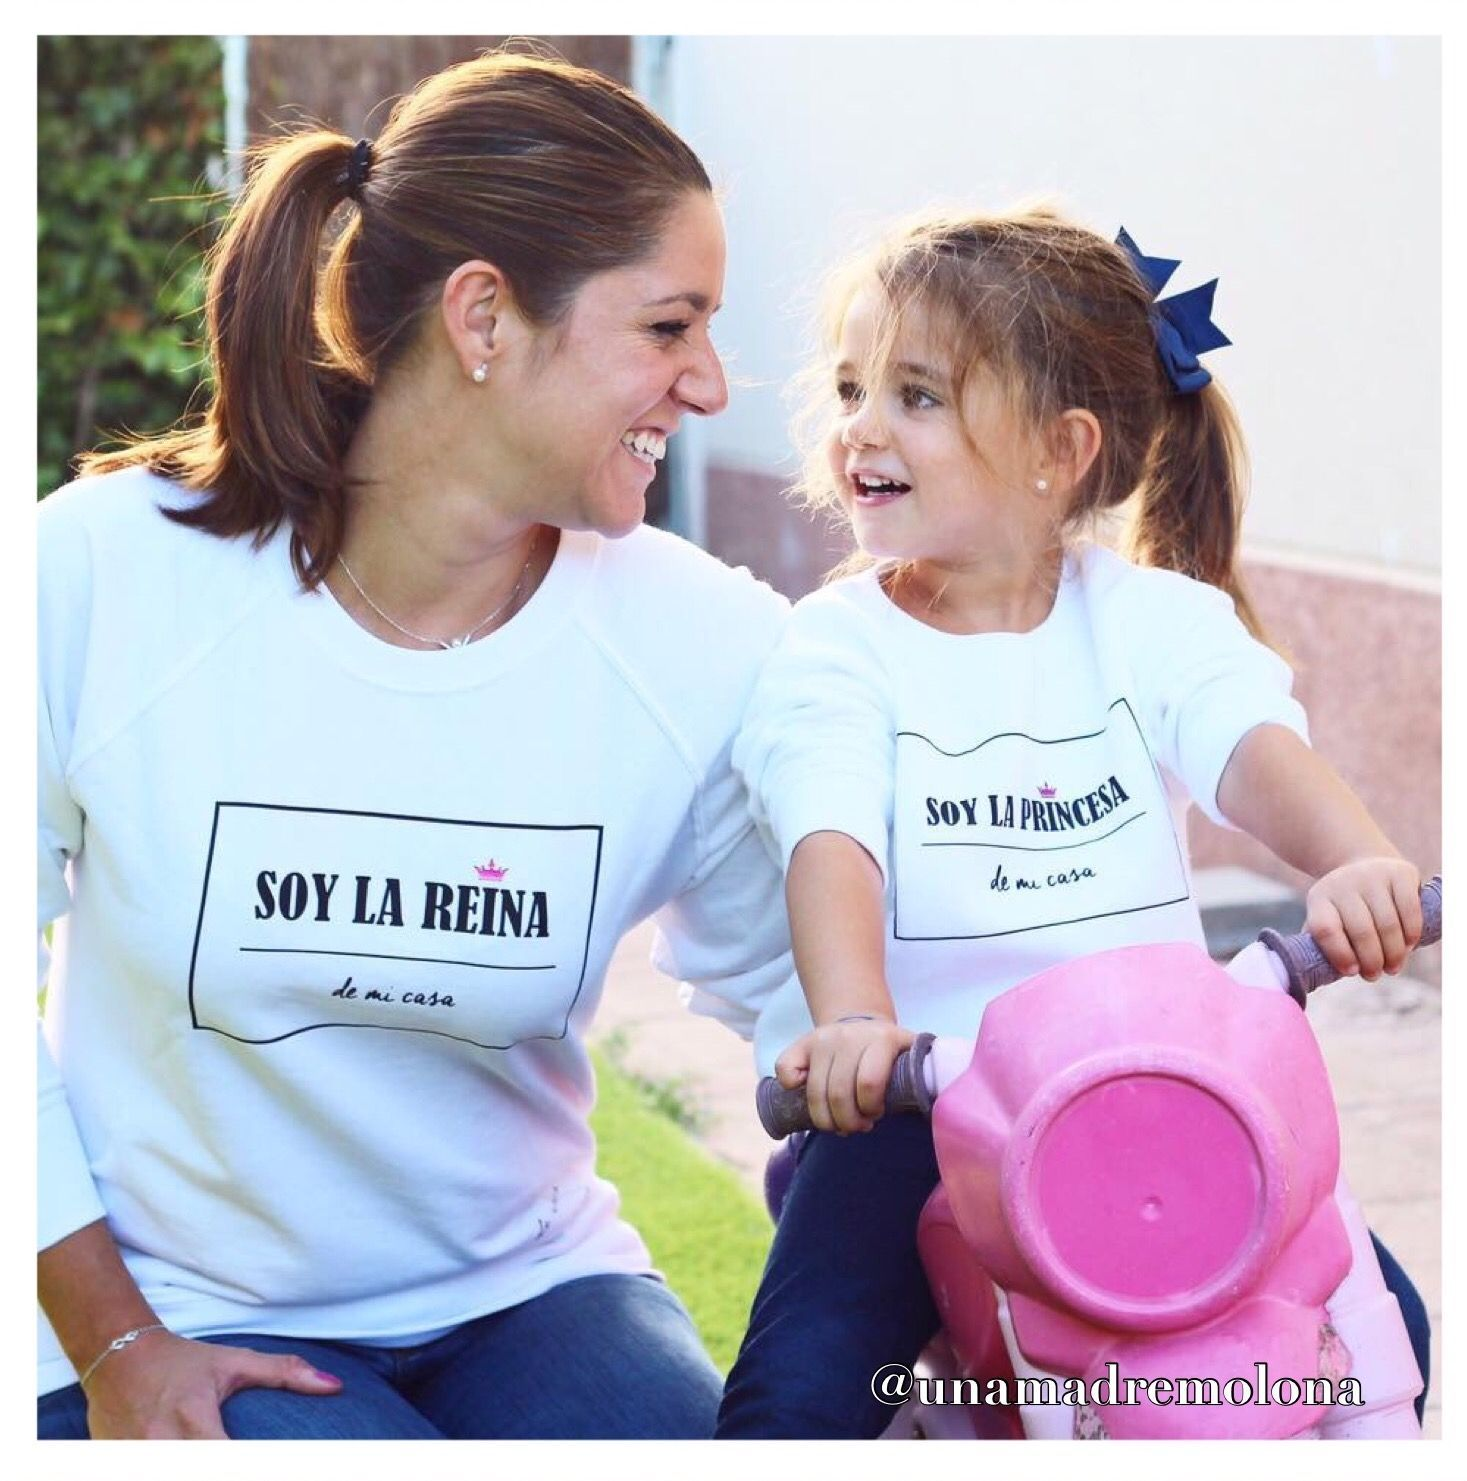 6305a706fb61 21 Tiendas para vestir madre e hija iguales | Hello Papis